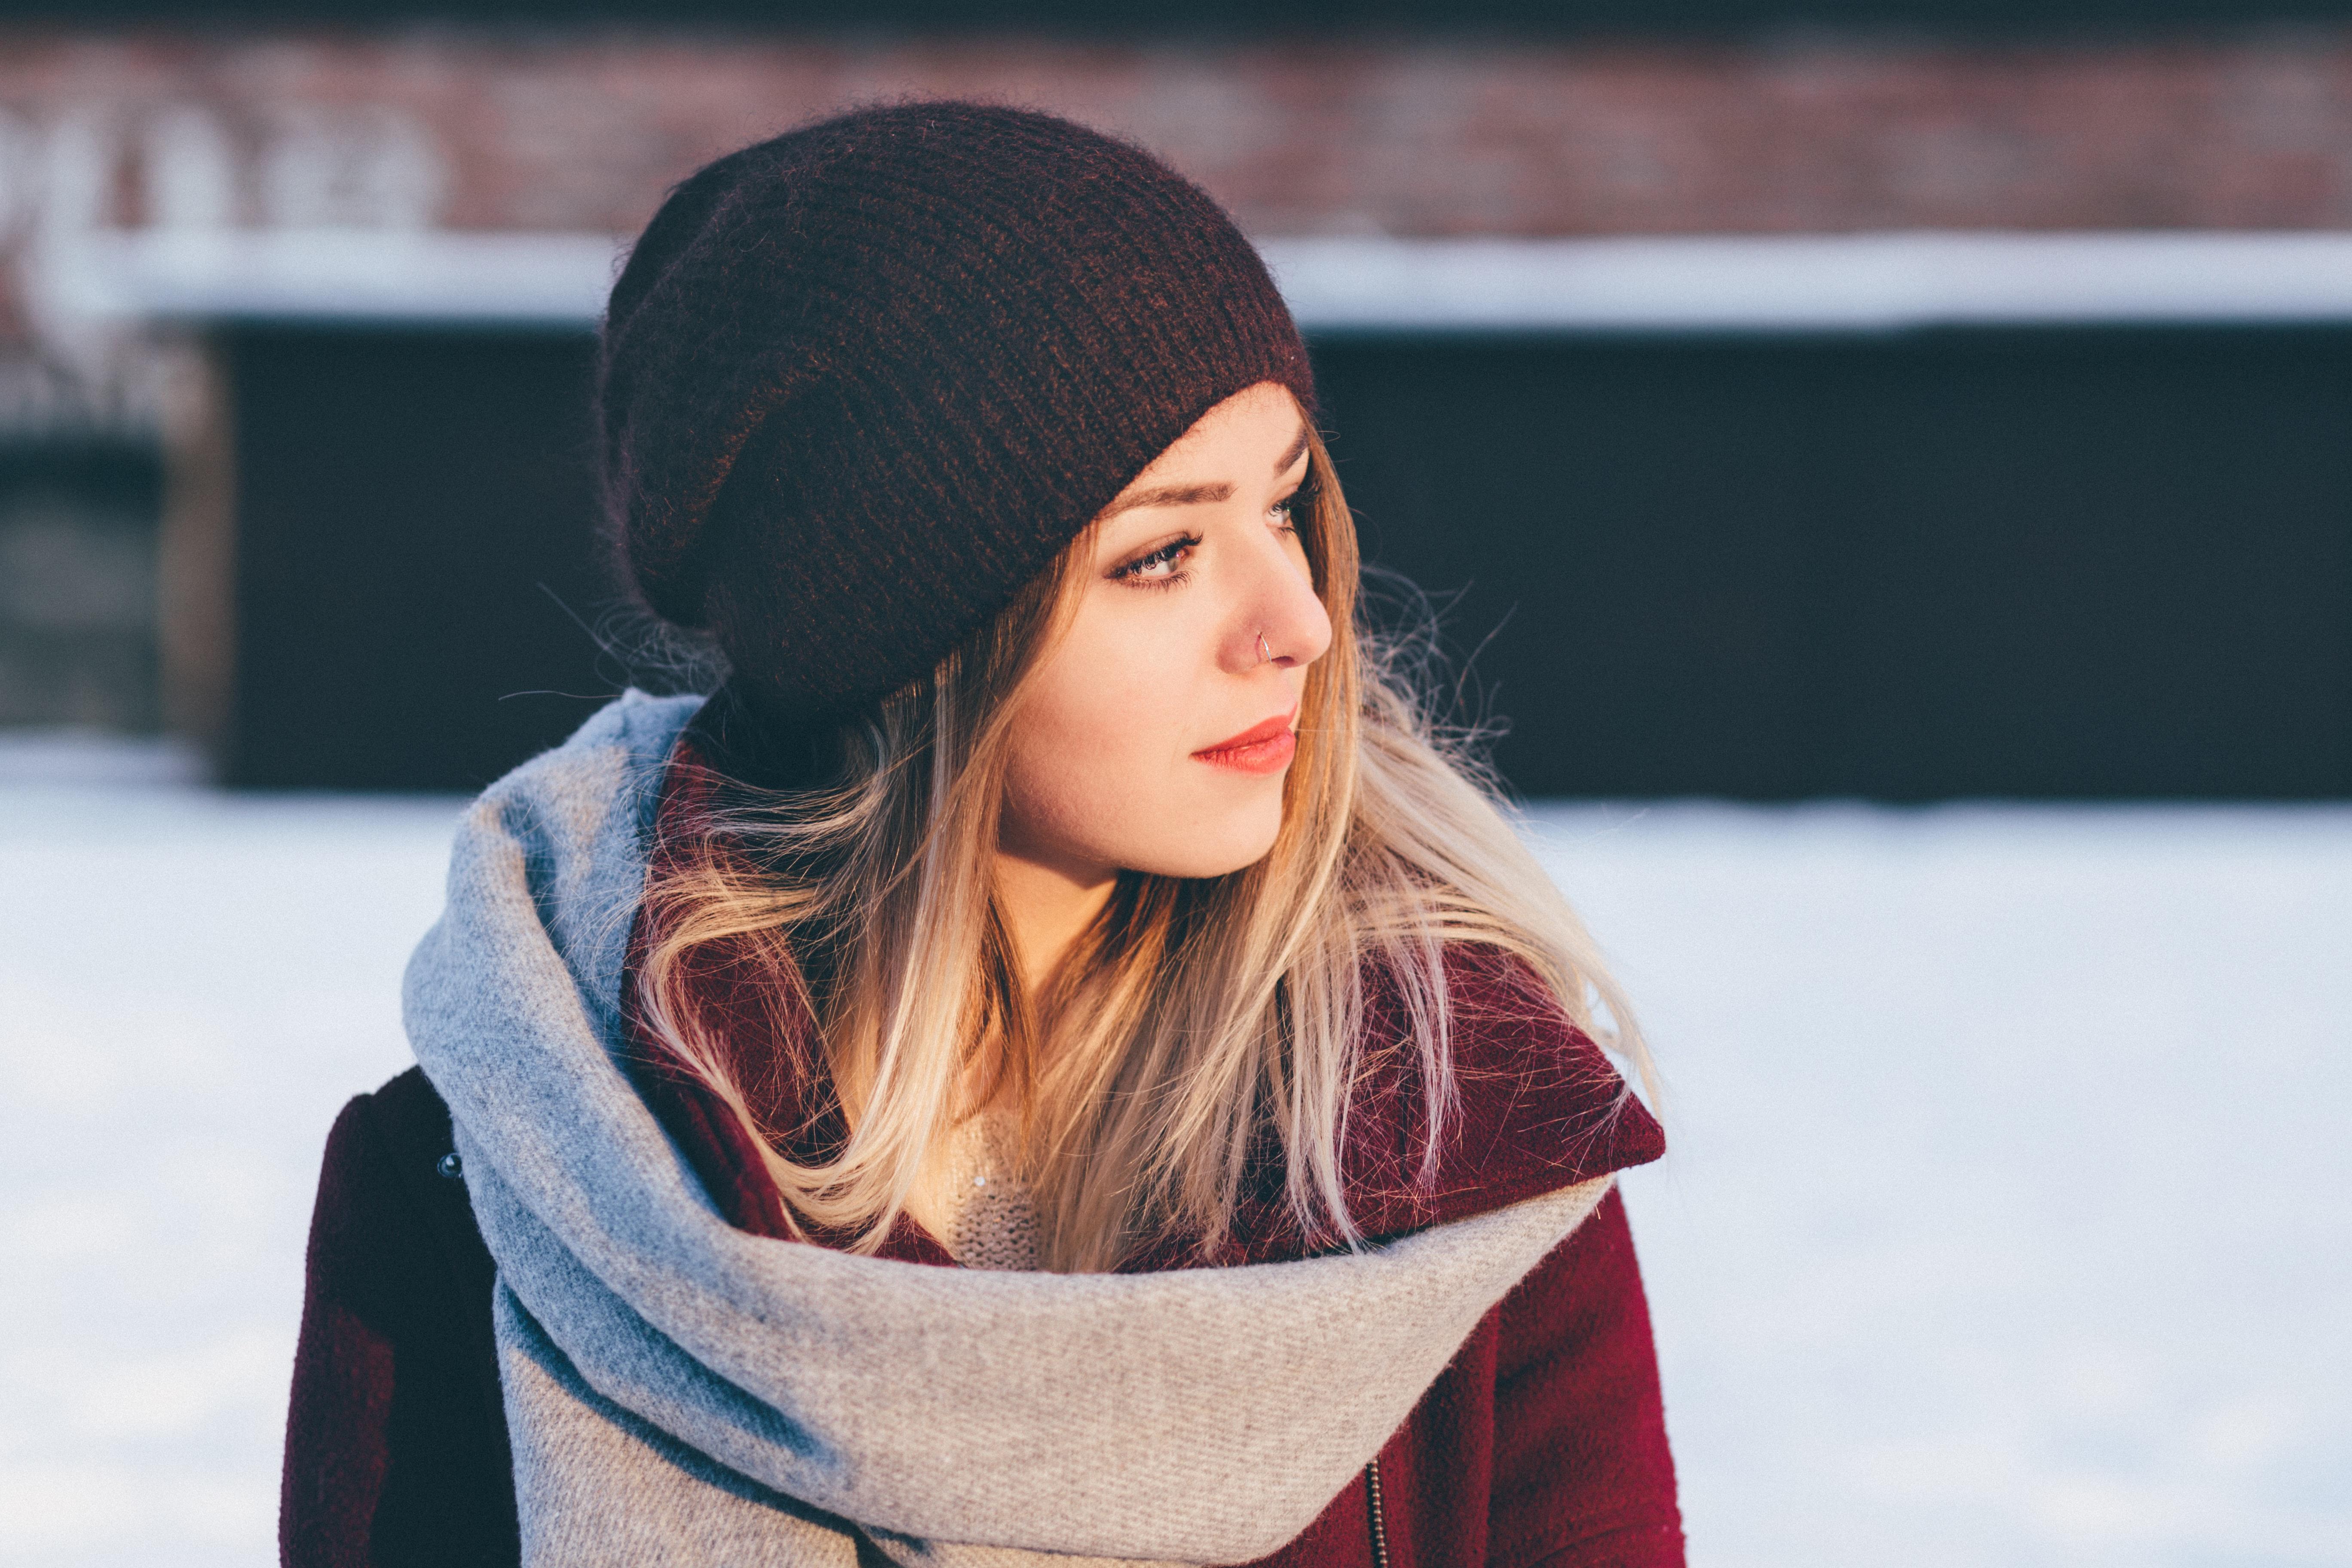 Adakah Cara Menumbuhkan Kembali Bulu Mata yang Sudah Rontok?